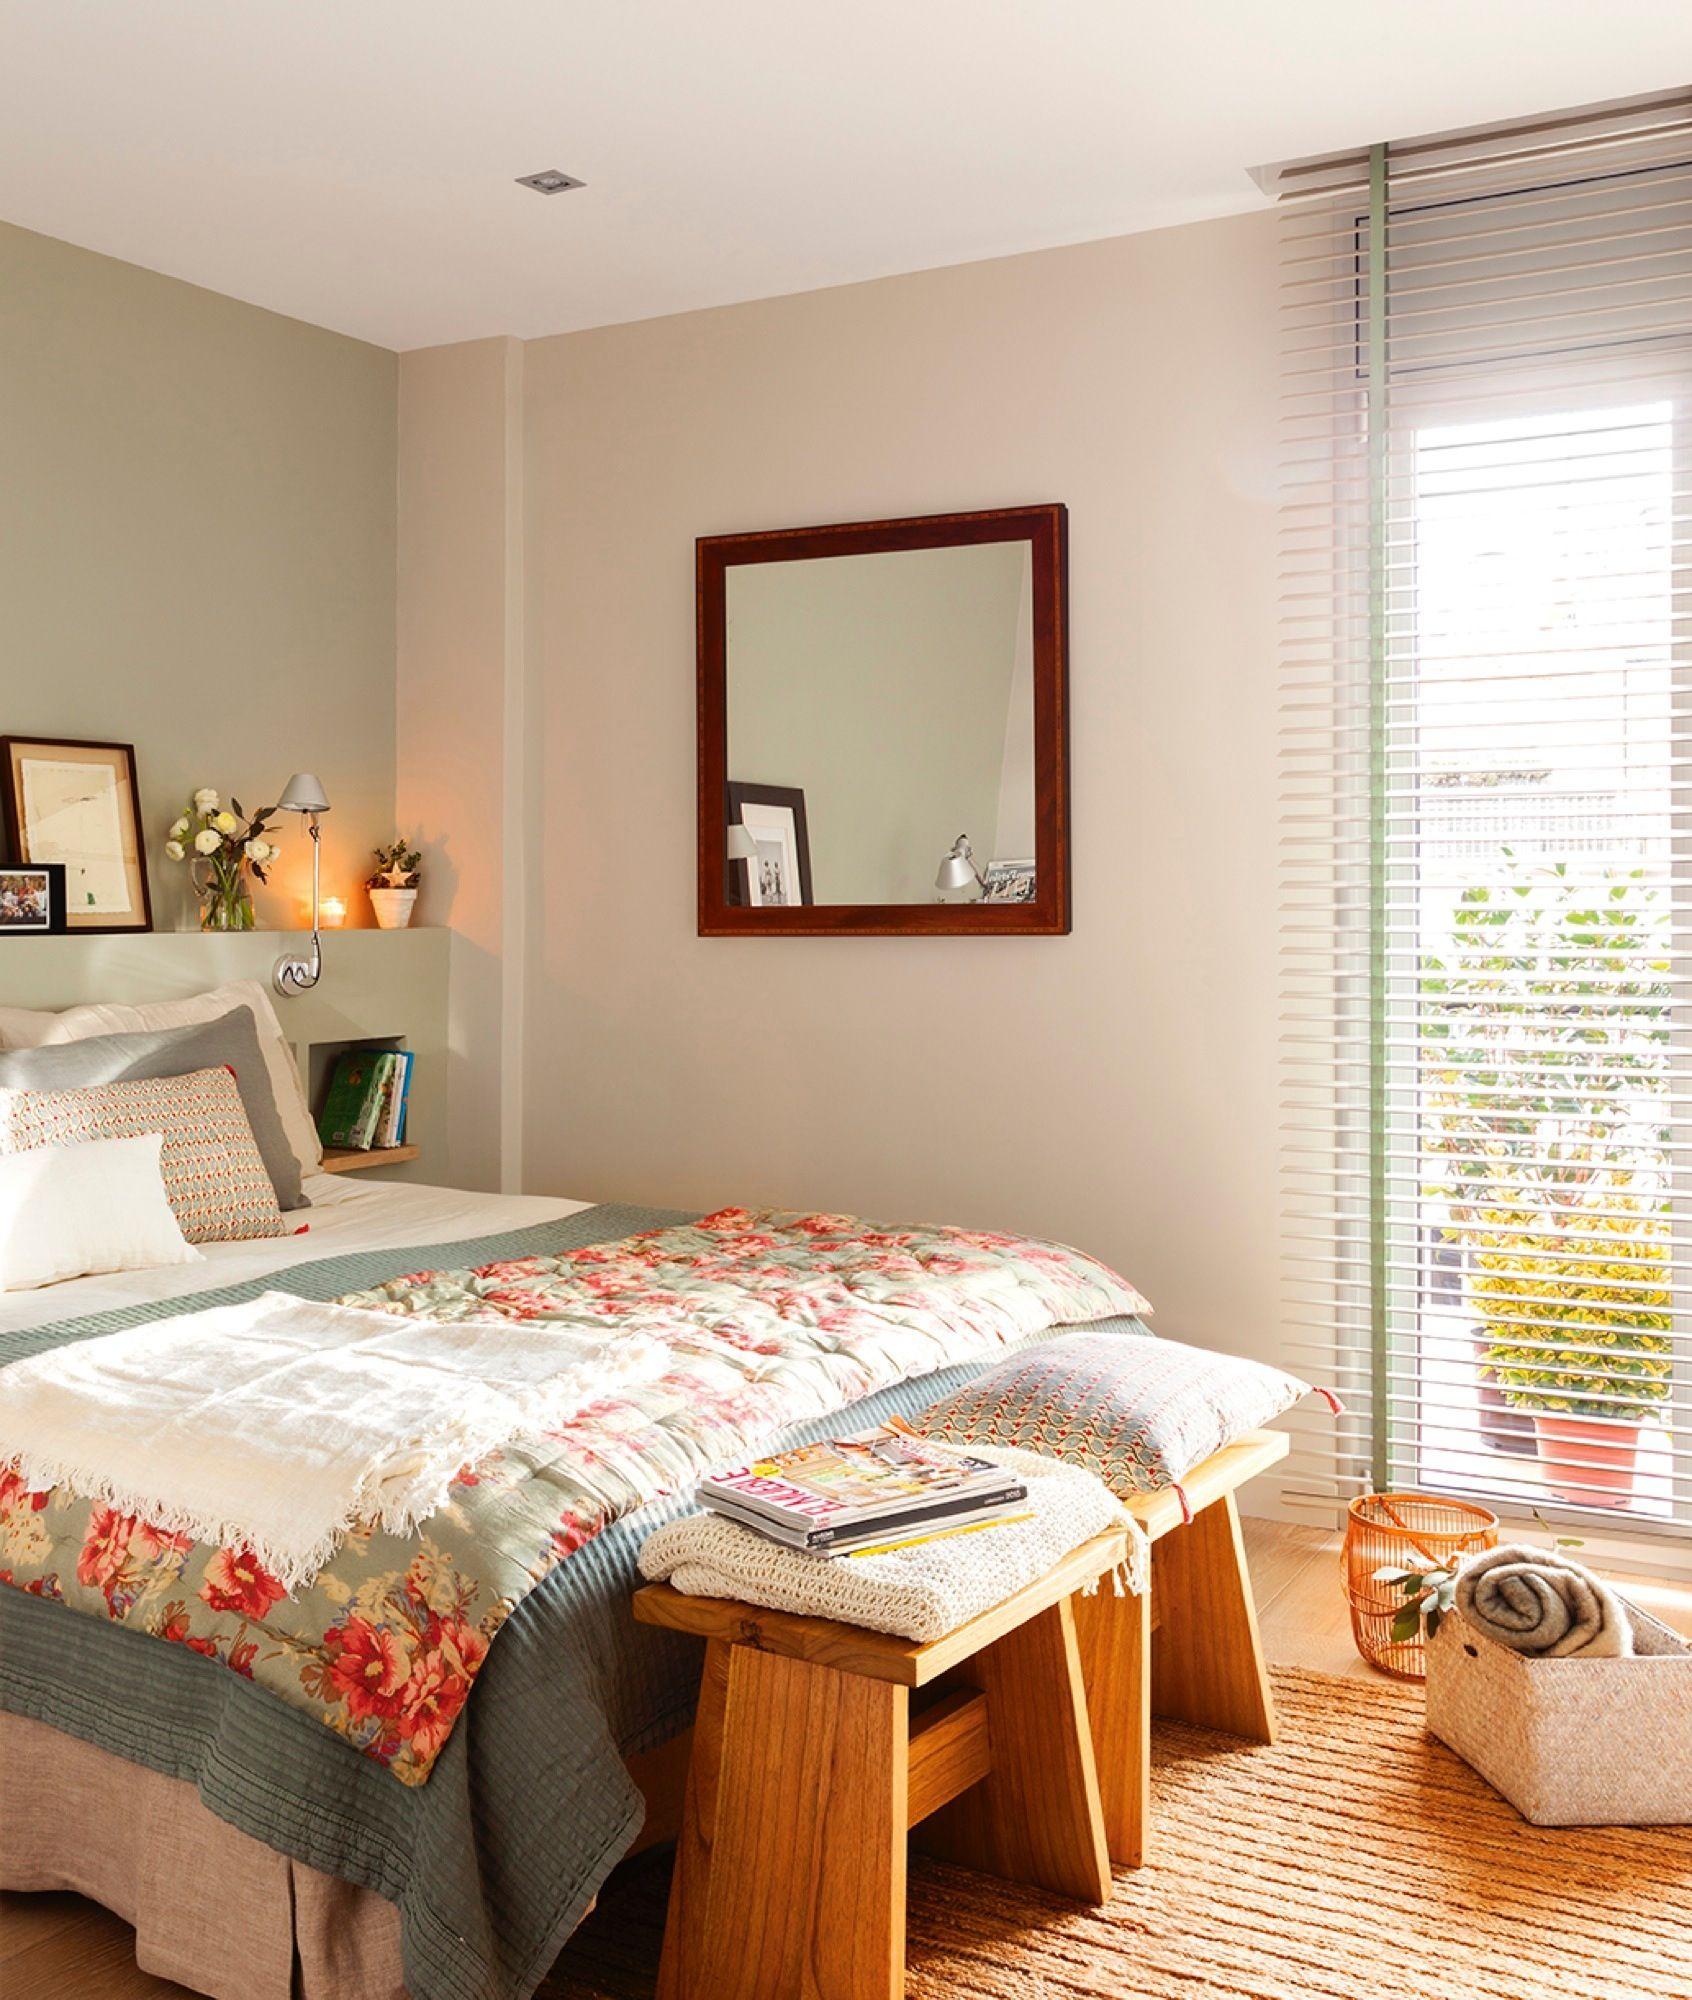 Dormitorio infantil con cama nido comunica al ba o por una - Dormitorio infantil cama nido ...